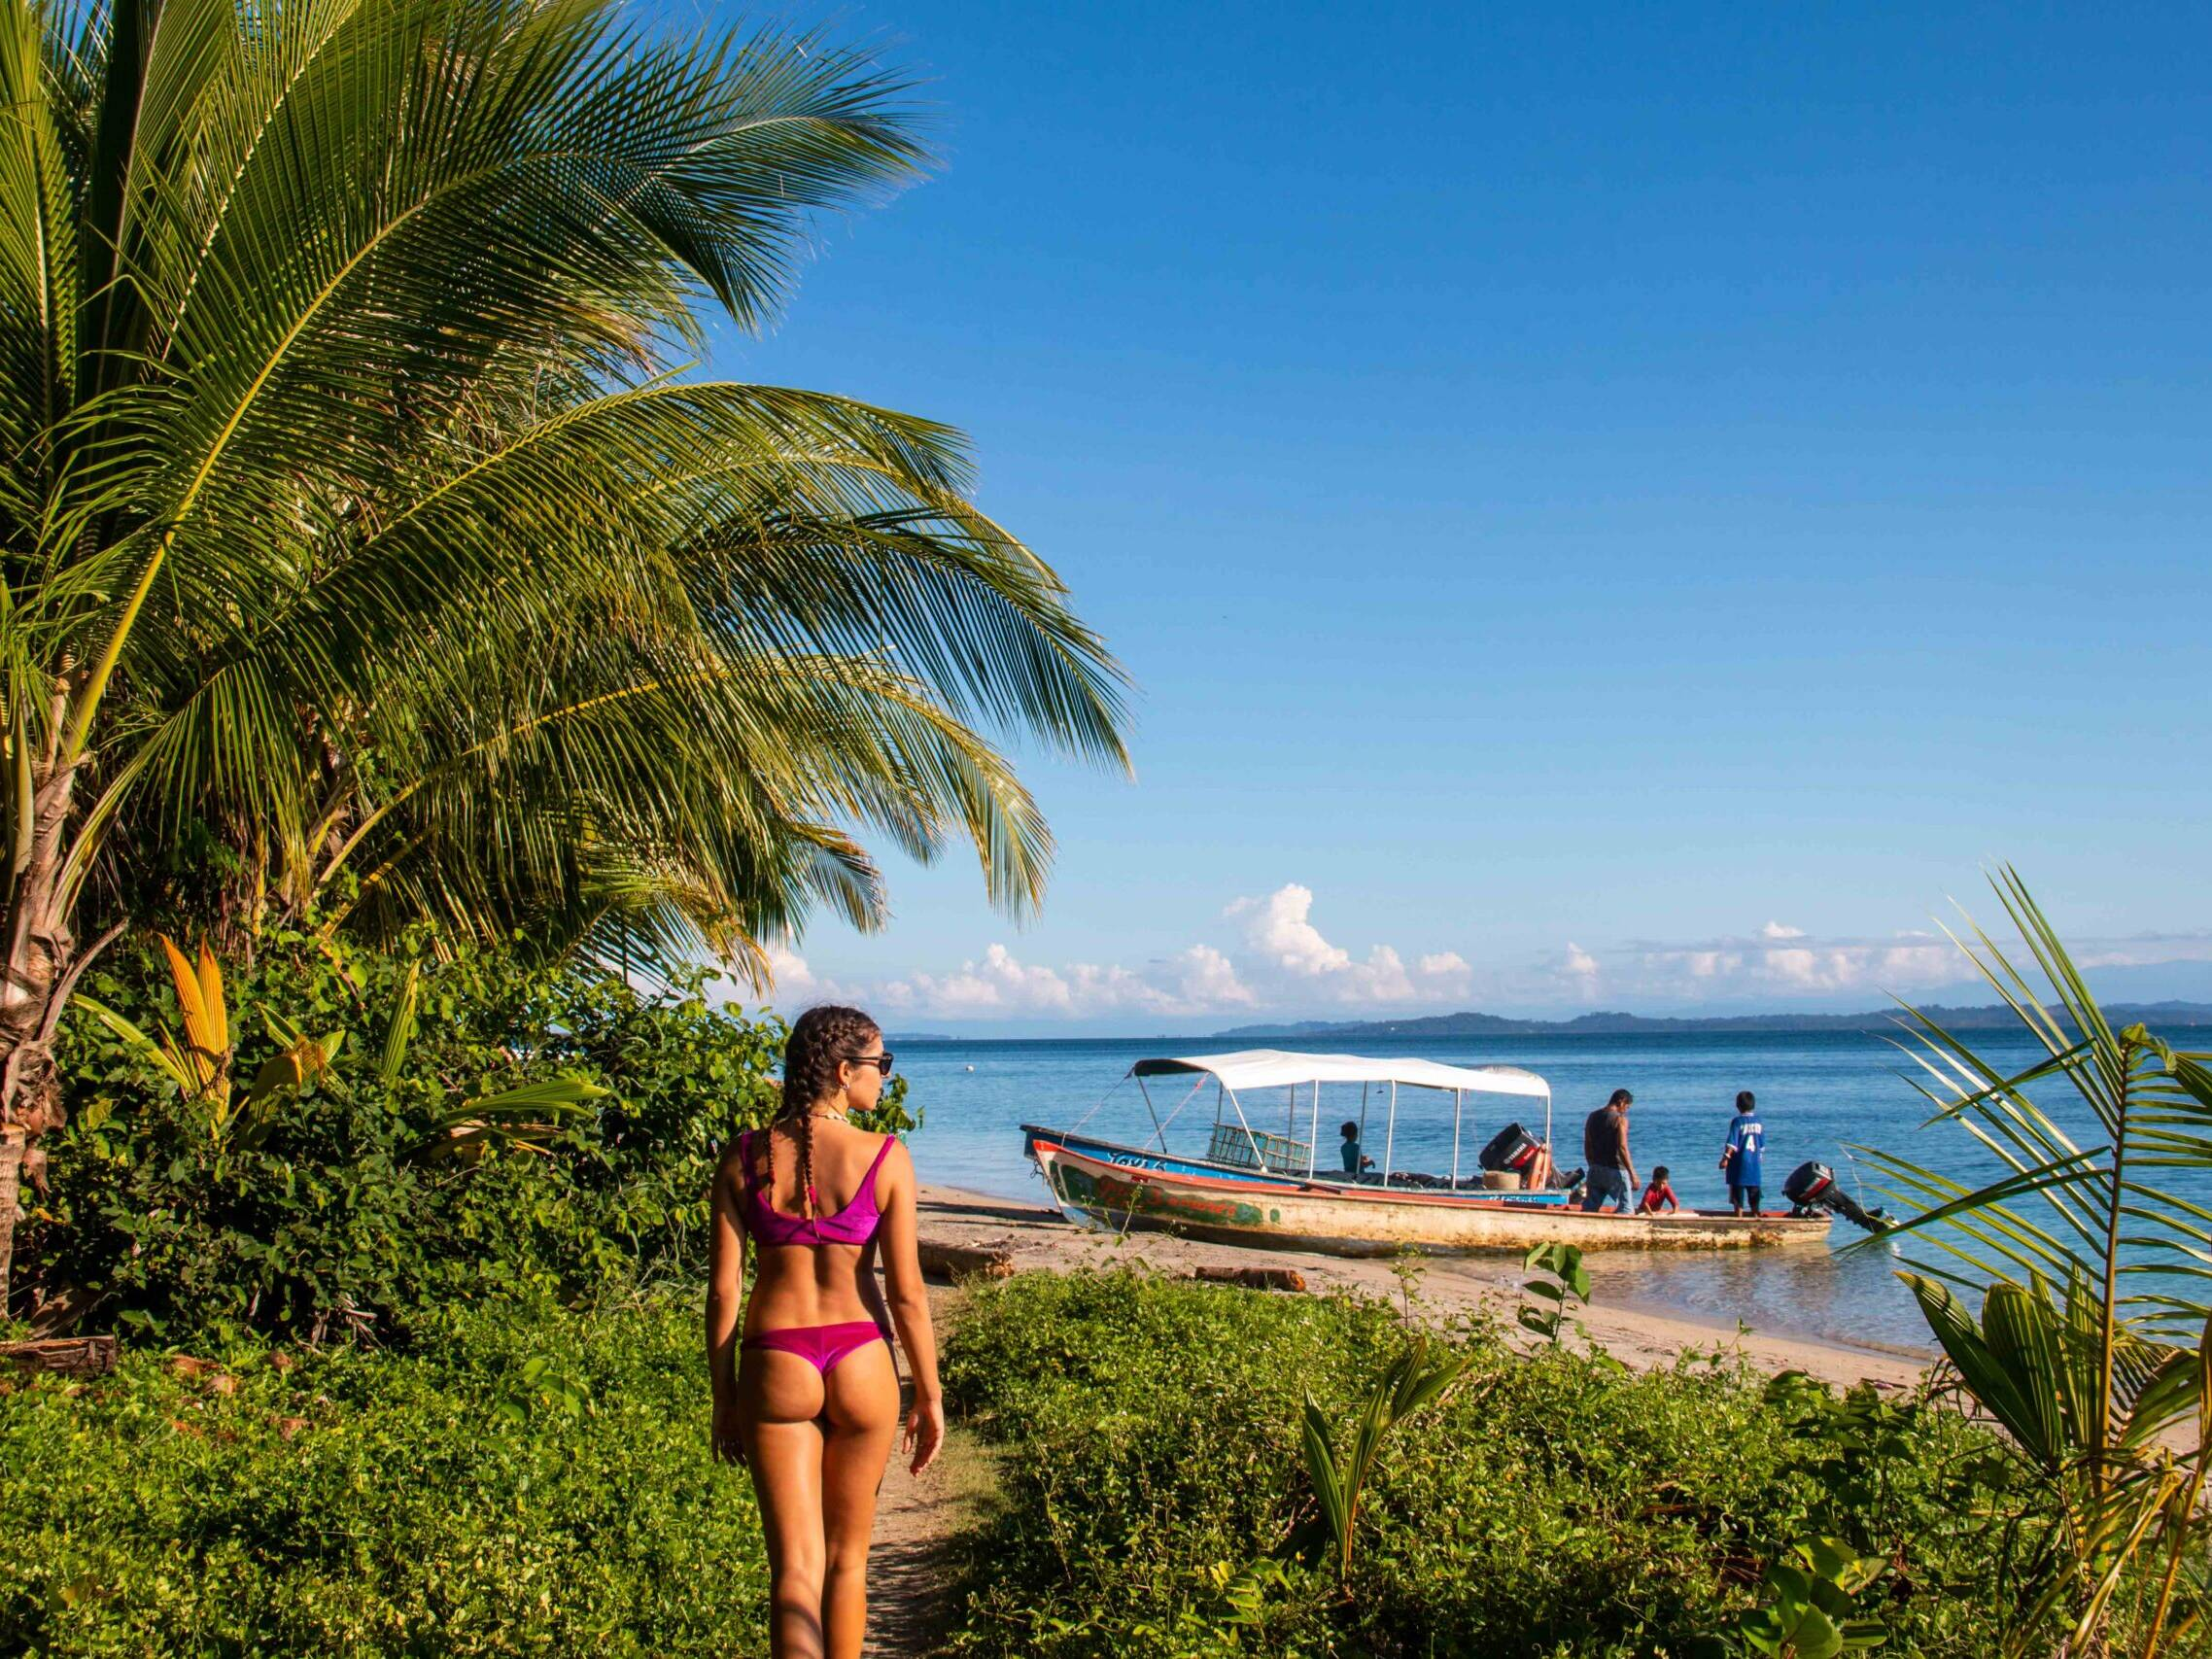 Beach in Bocas del Toro Panama